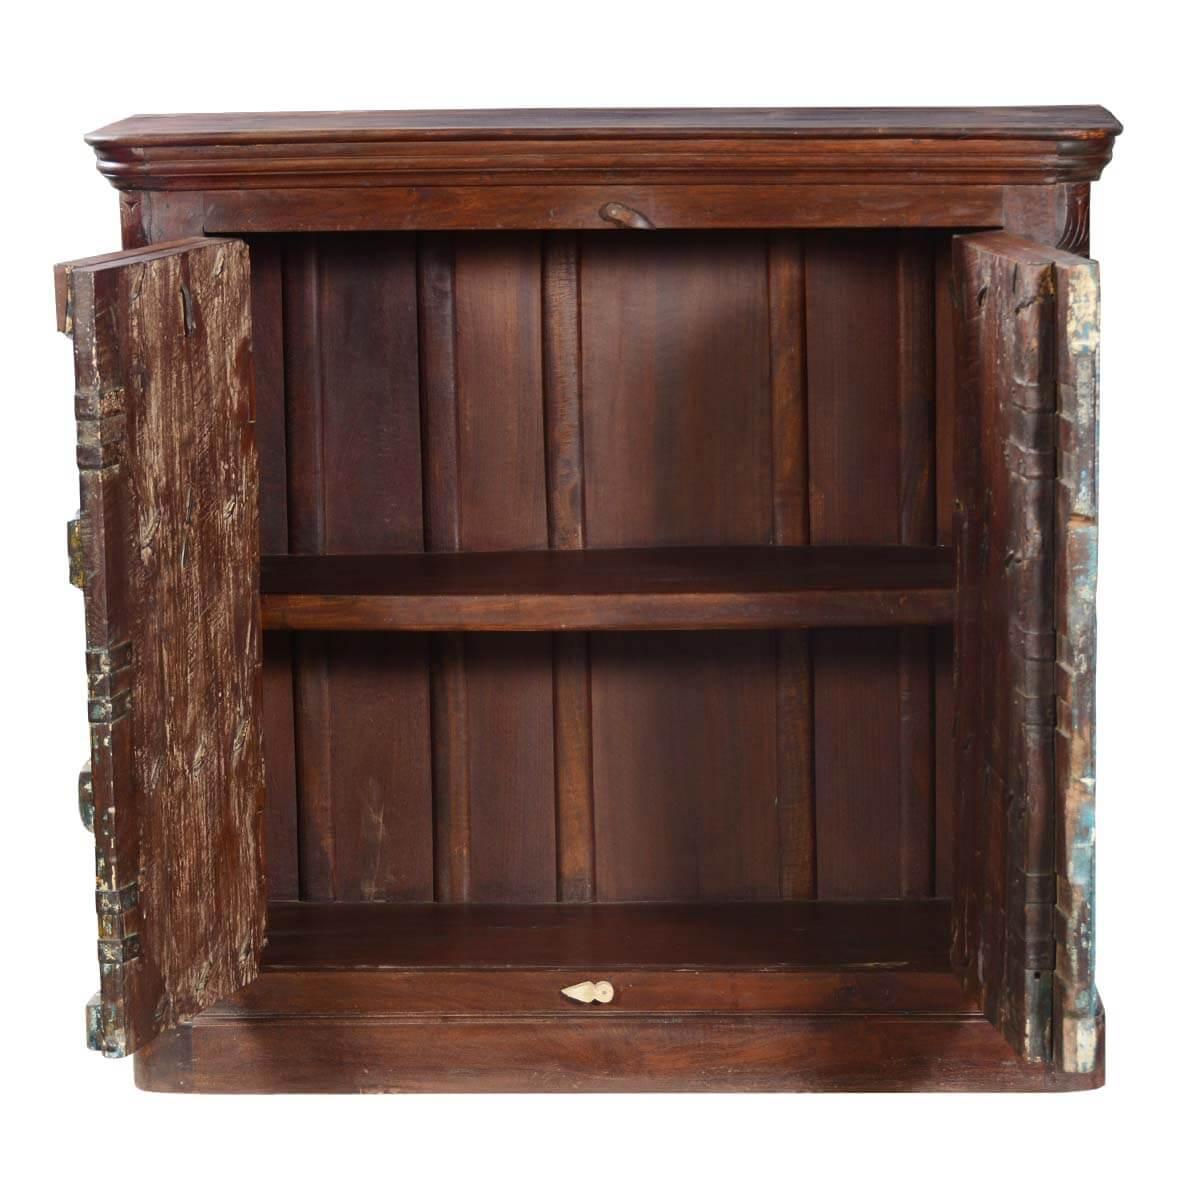 ... 50u201d Reclaimed Wood Storage Cabinet New Orleans Rustic Sideboard Buffet  ...